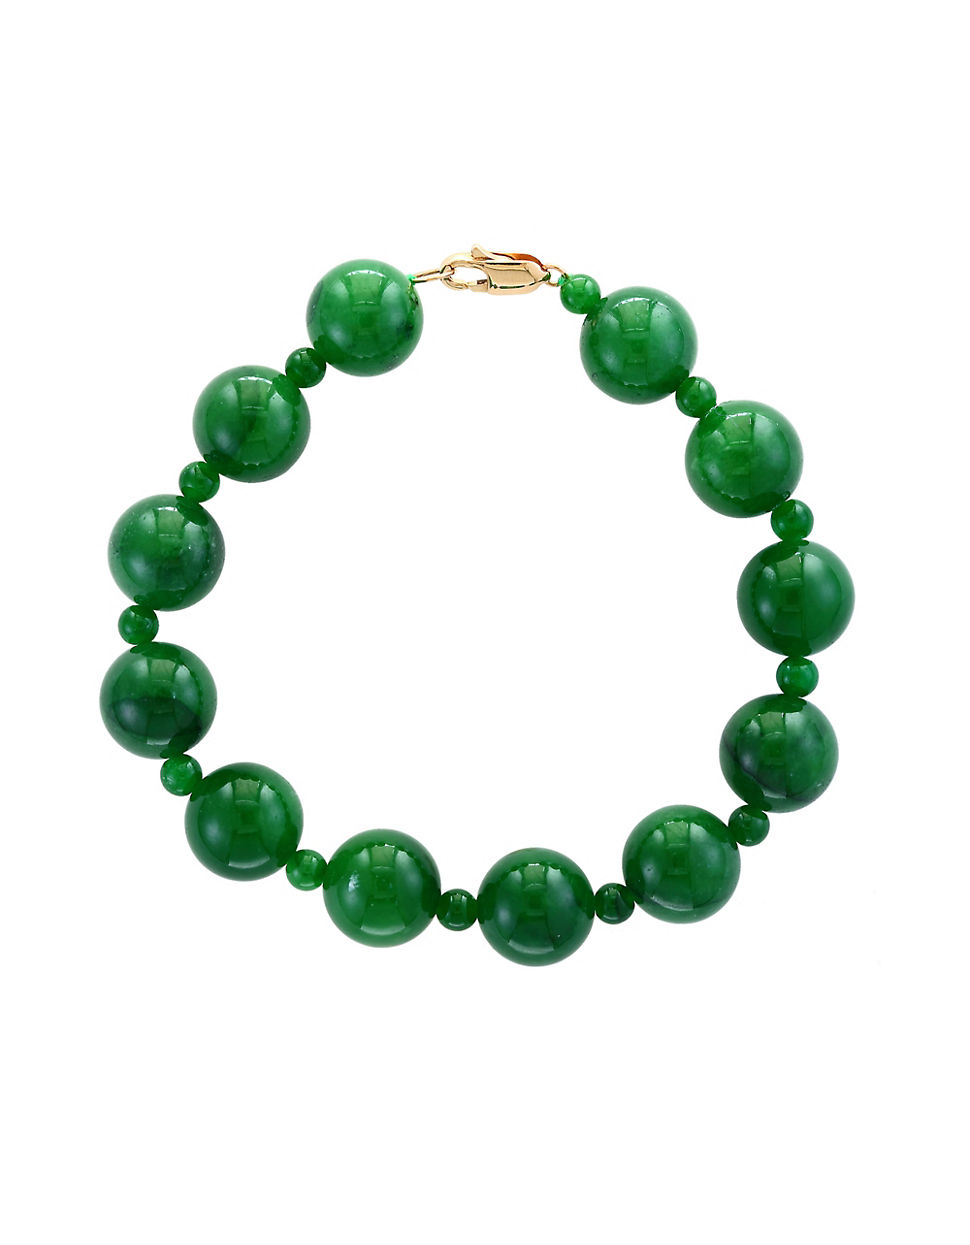 Bracelets - Pearl, Diamond, Gold & More | Hudson\'s Bay